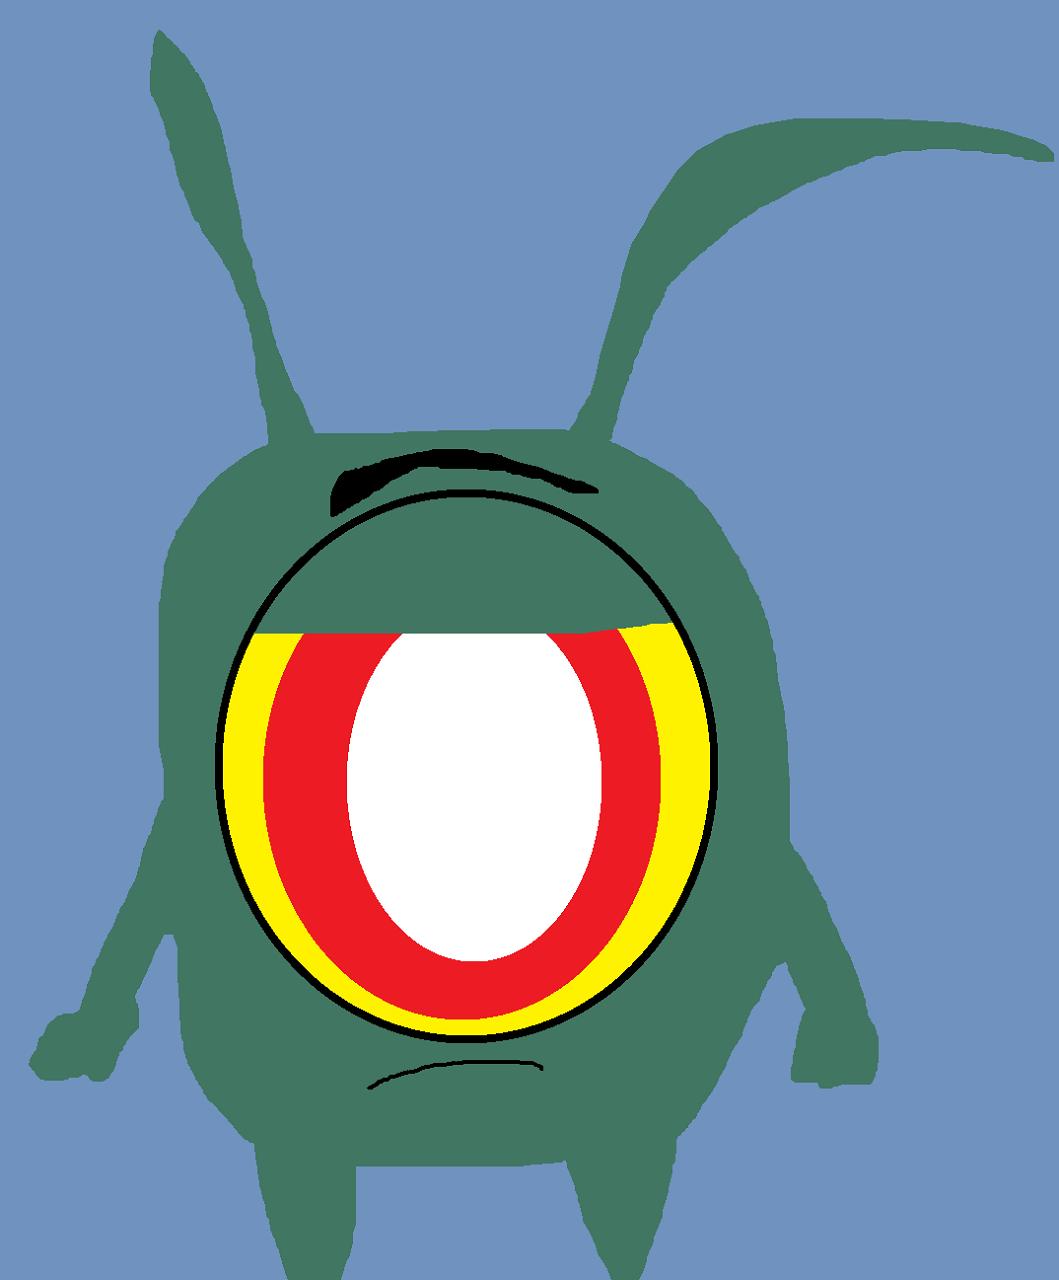 A Grumpy Bean by Falconlobo